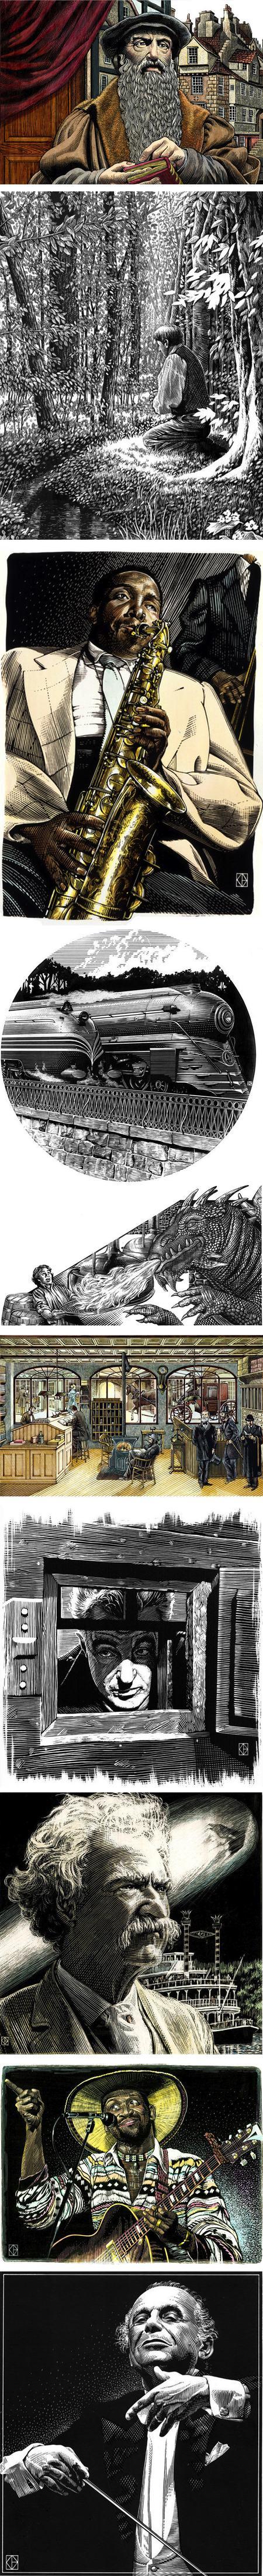 Kent Barton, illustration, scratchboard, linocut and woodcut